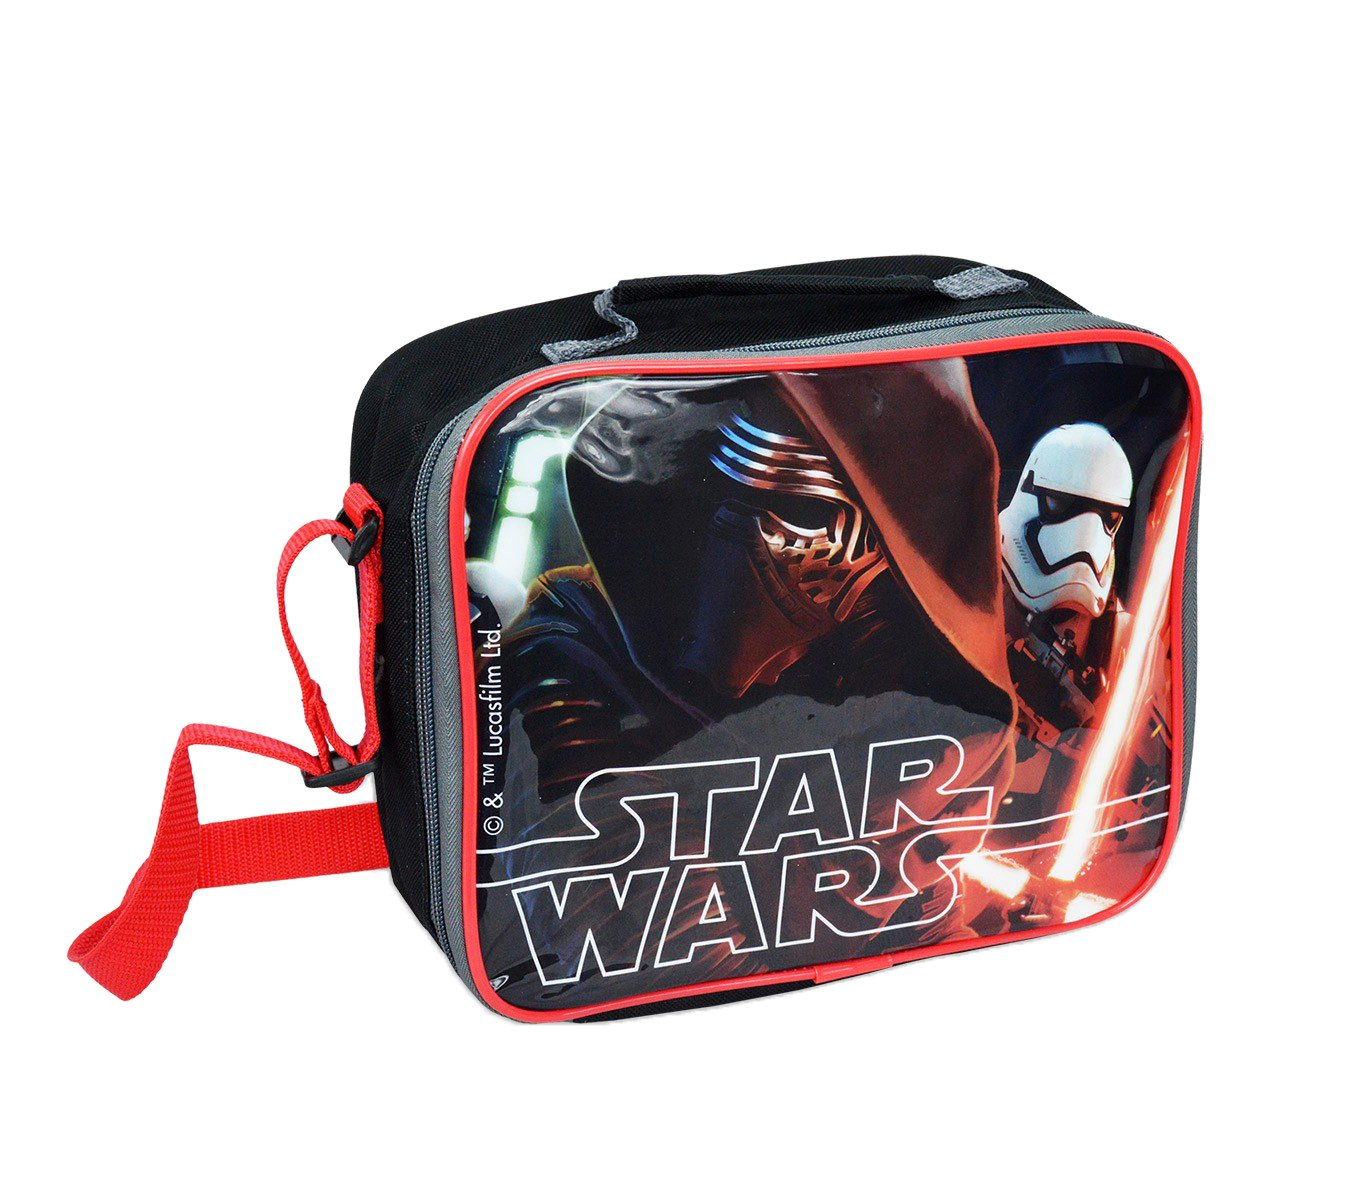 SWE7046 Borsa a tracolla porta merenda termica Star Wars 26 x 20 x 9 cm.MEDIA WAVE store ®